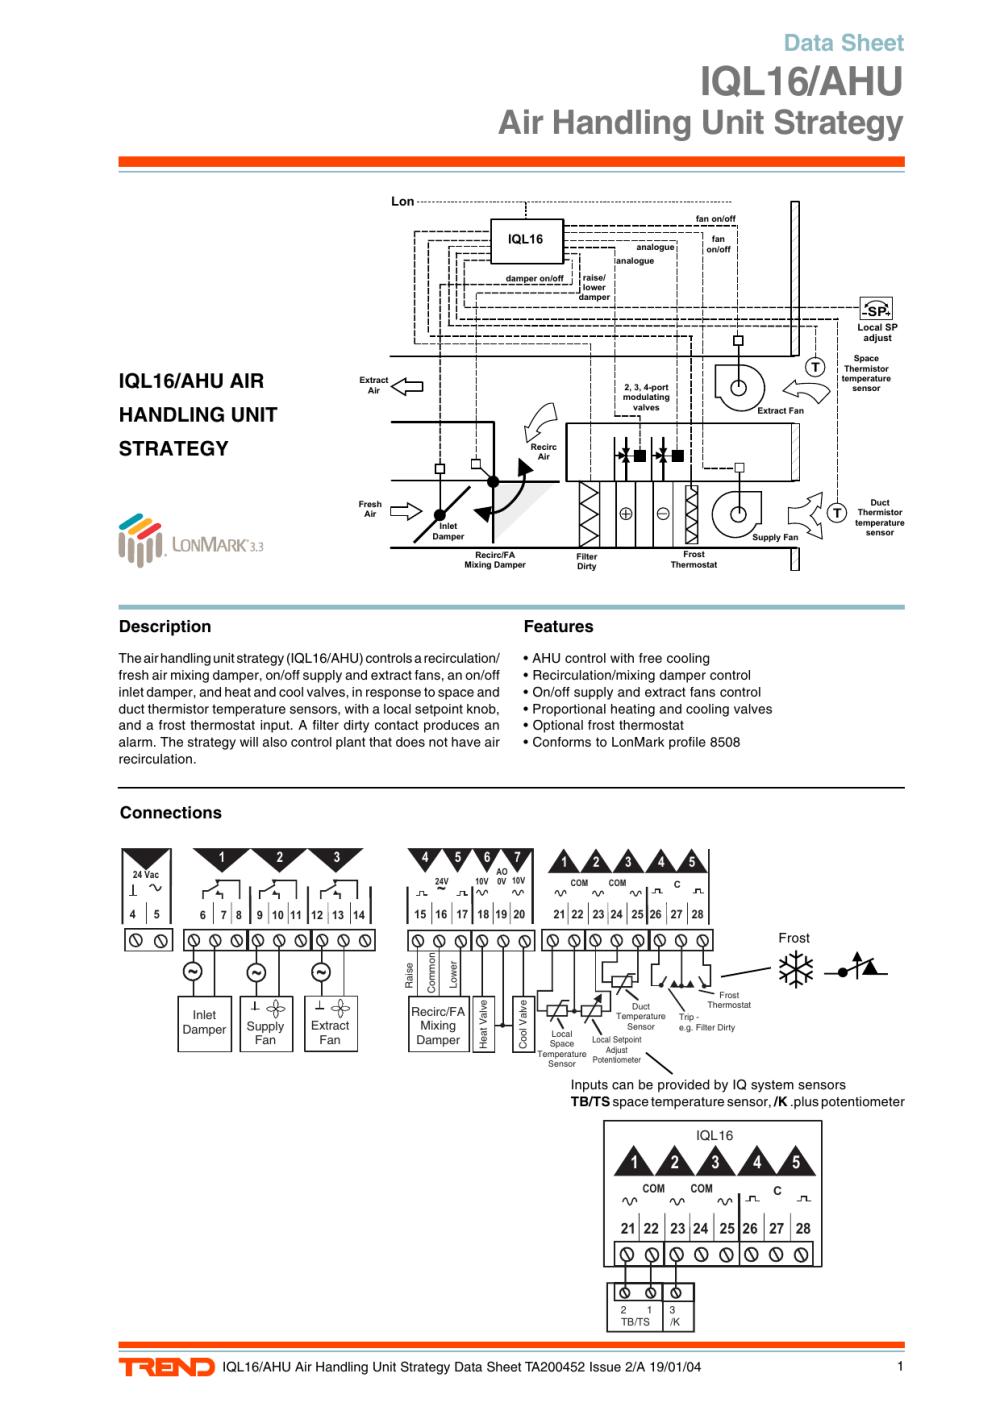 medium resolution of iql16 ahu air handling unit strategy data sheet